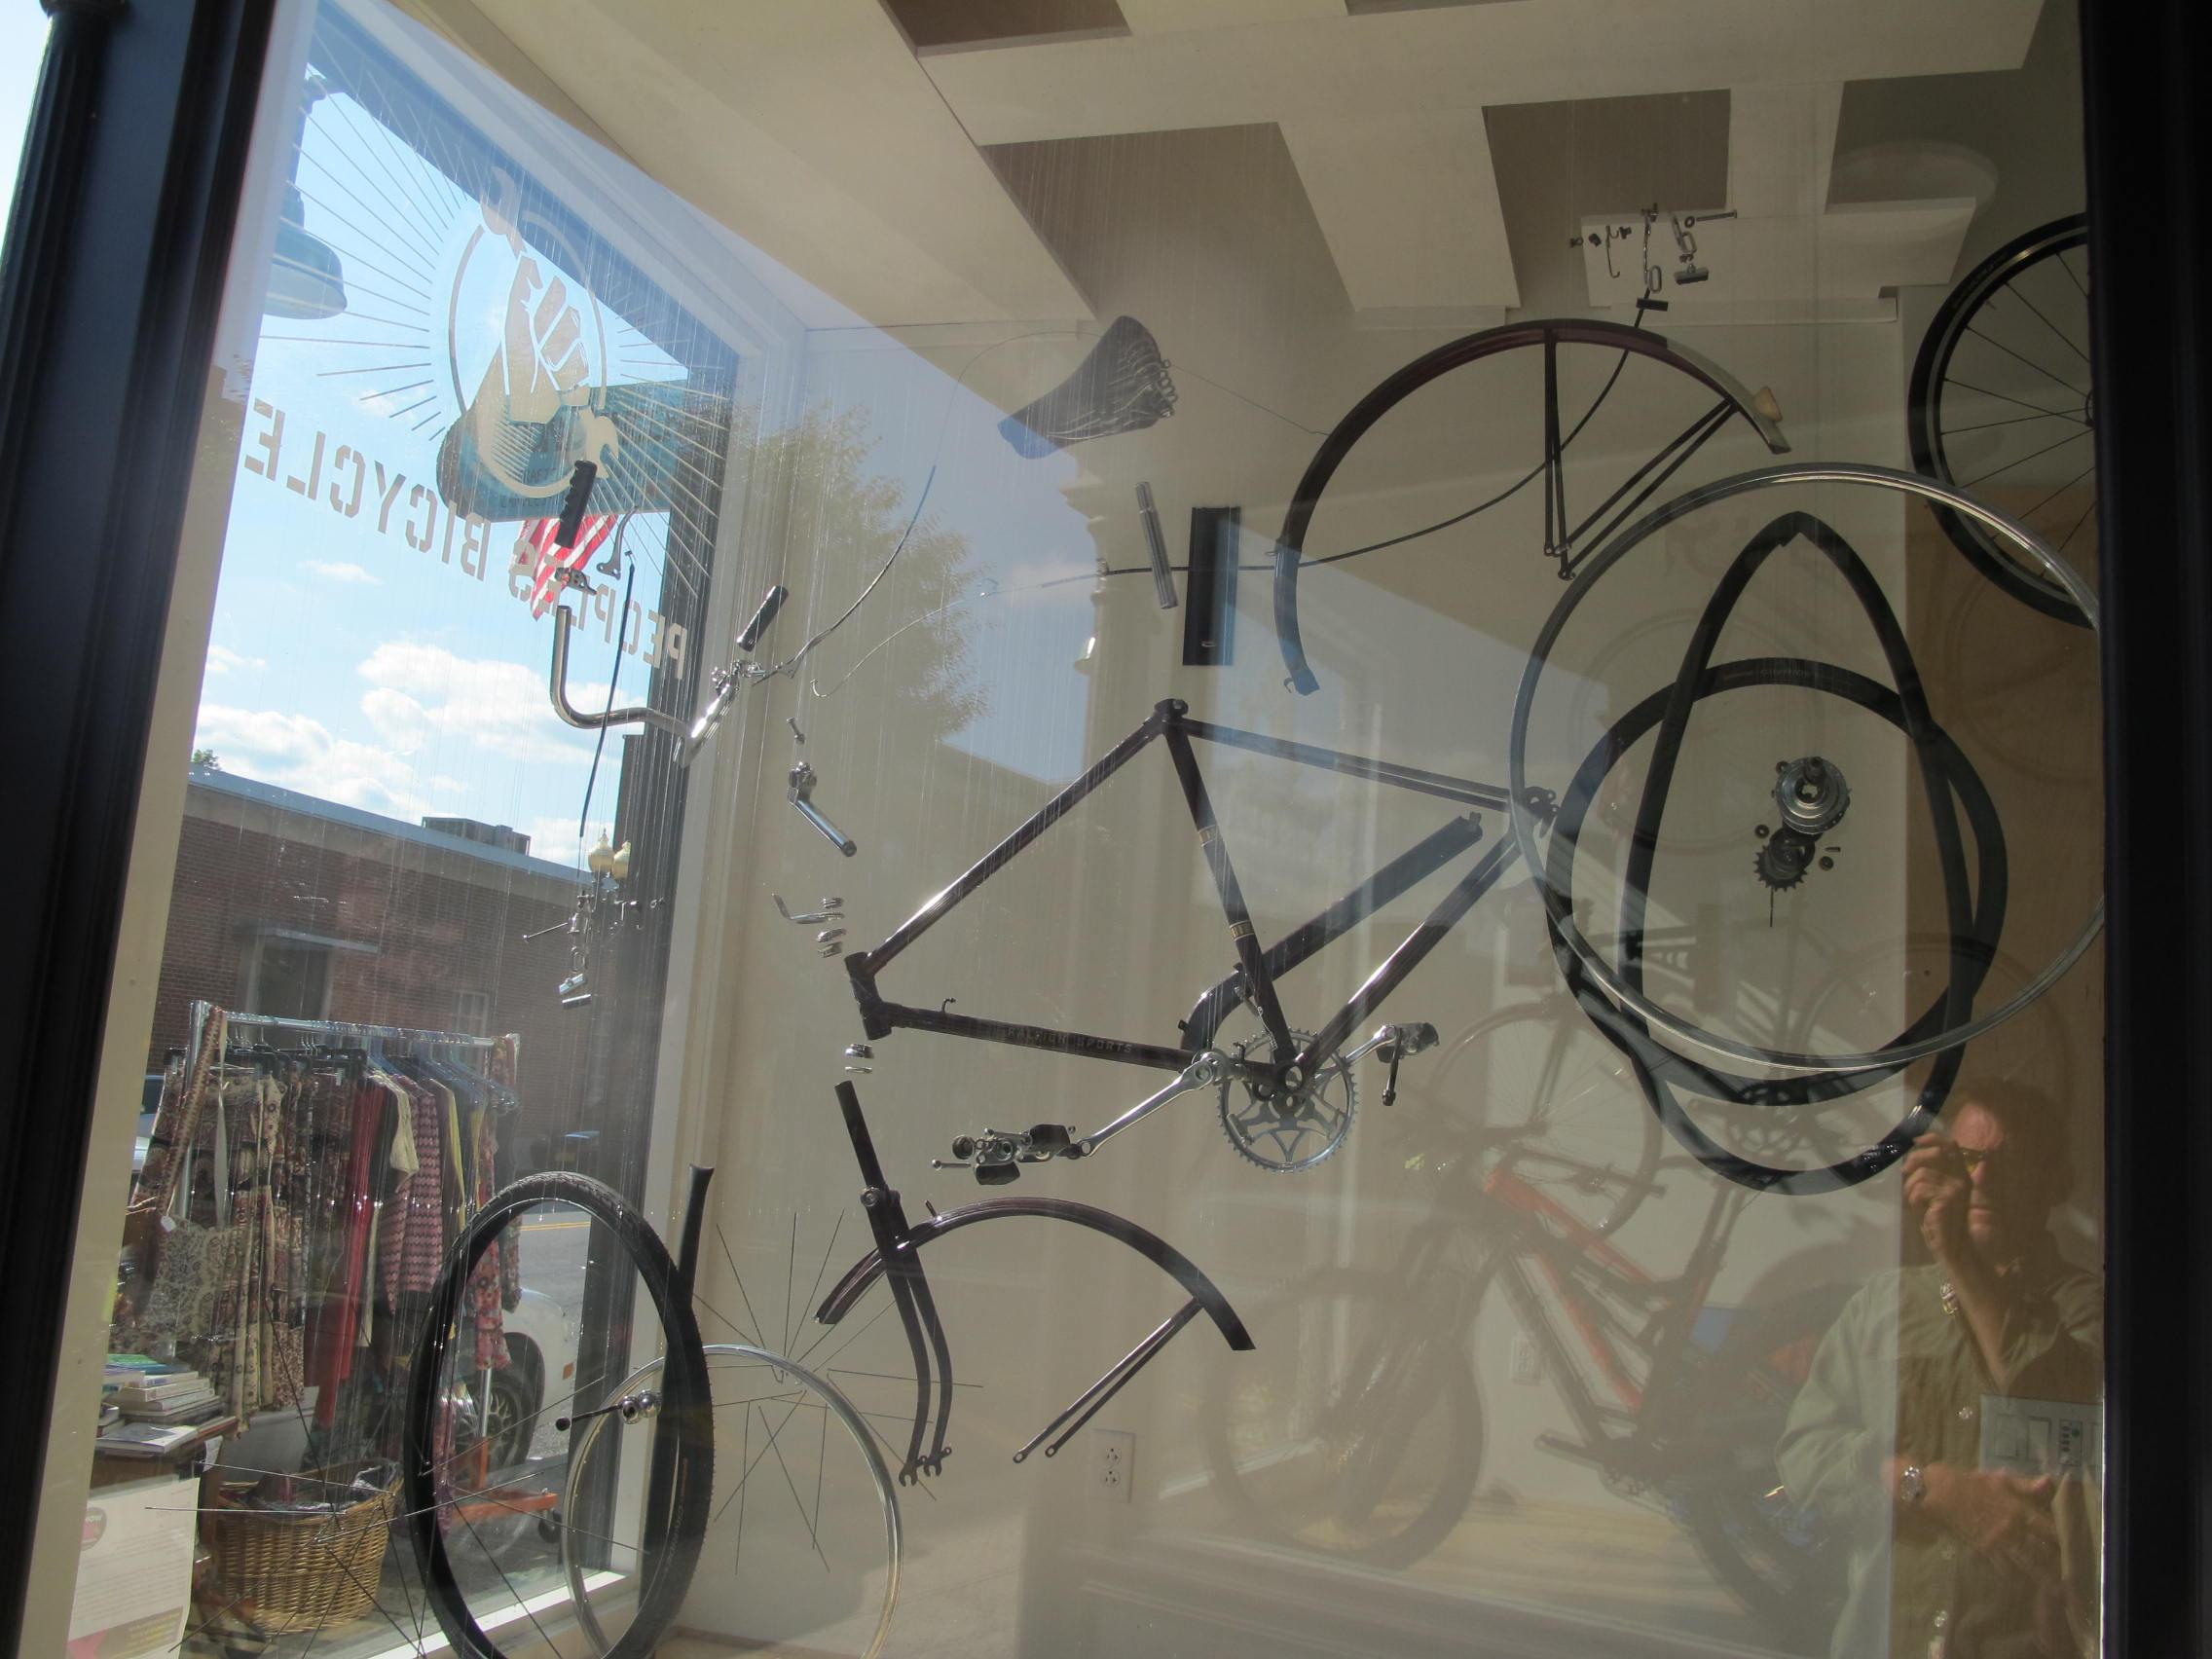 Bicycling 101 Postponed